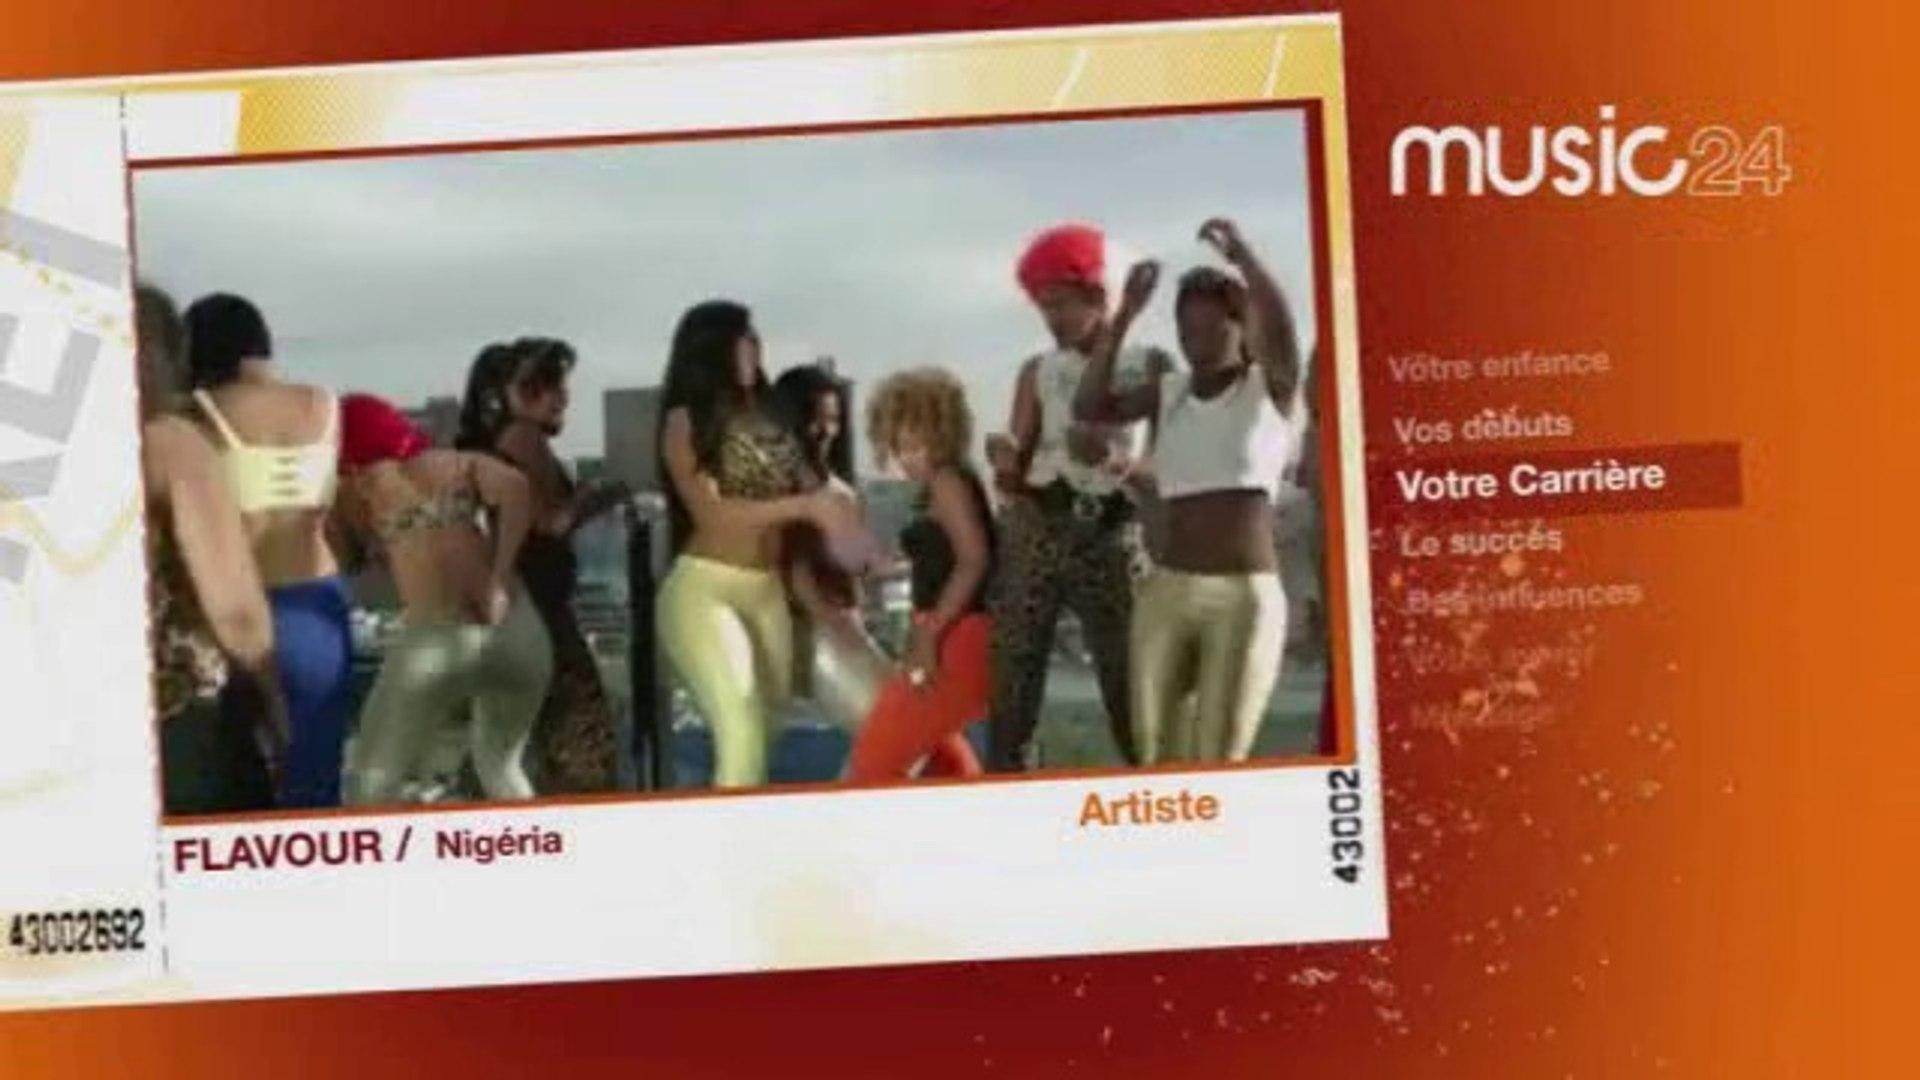 MUSIC 24 - FLAVOUR - Nigéria